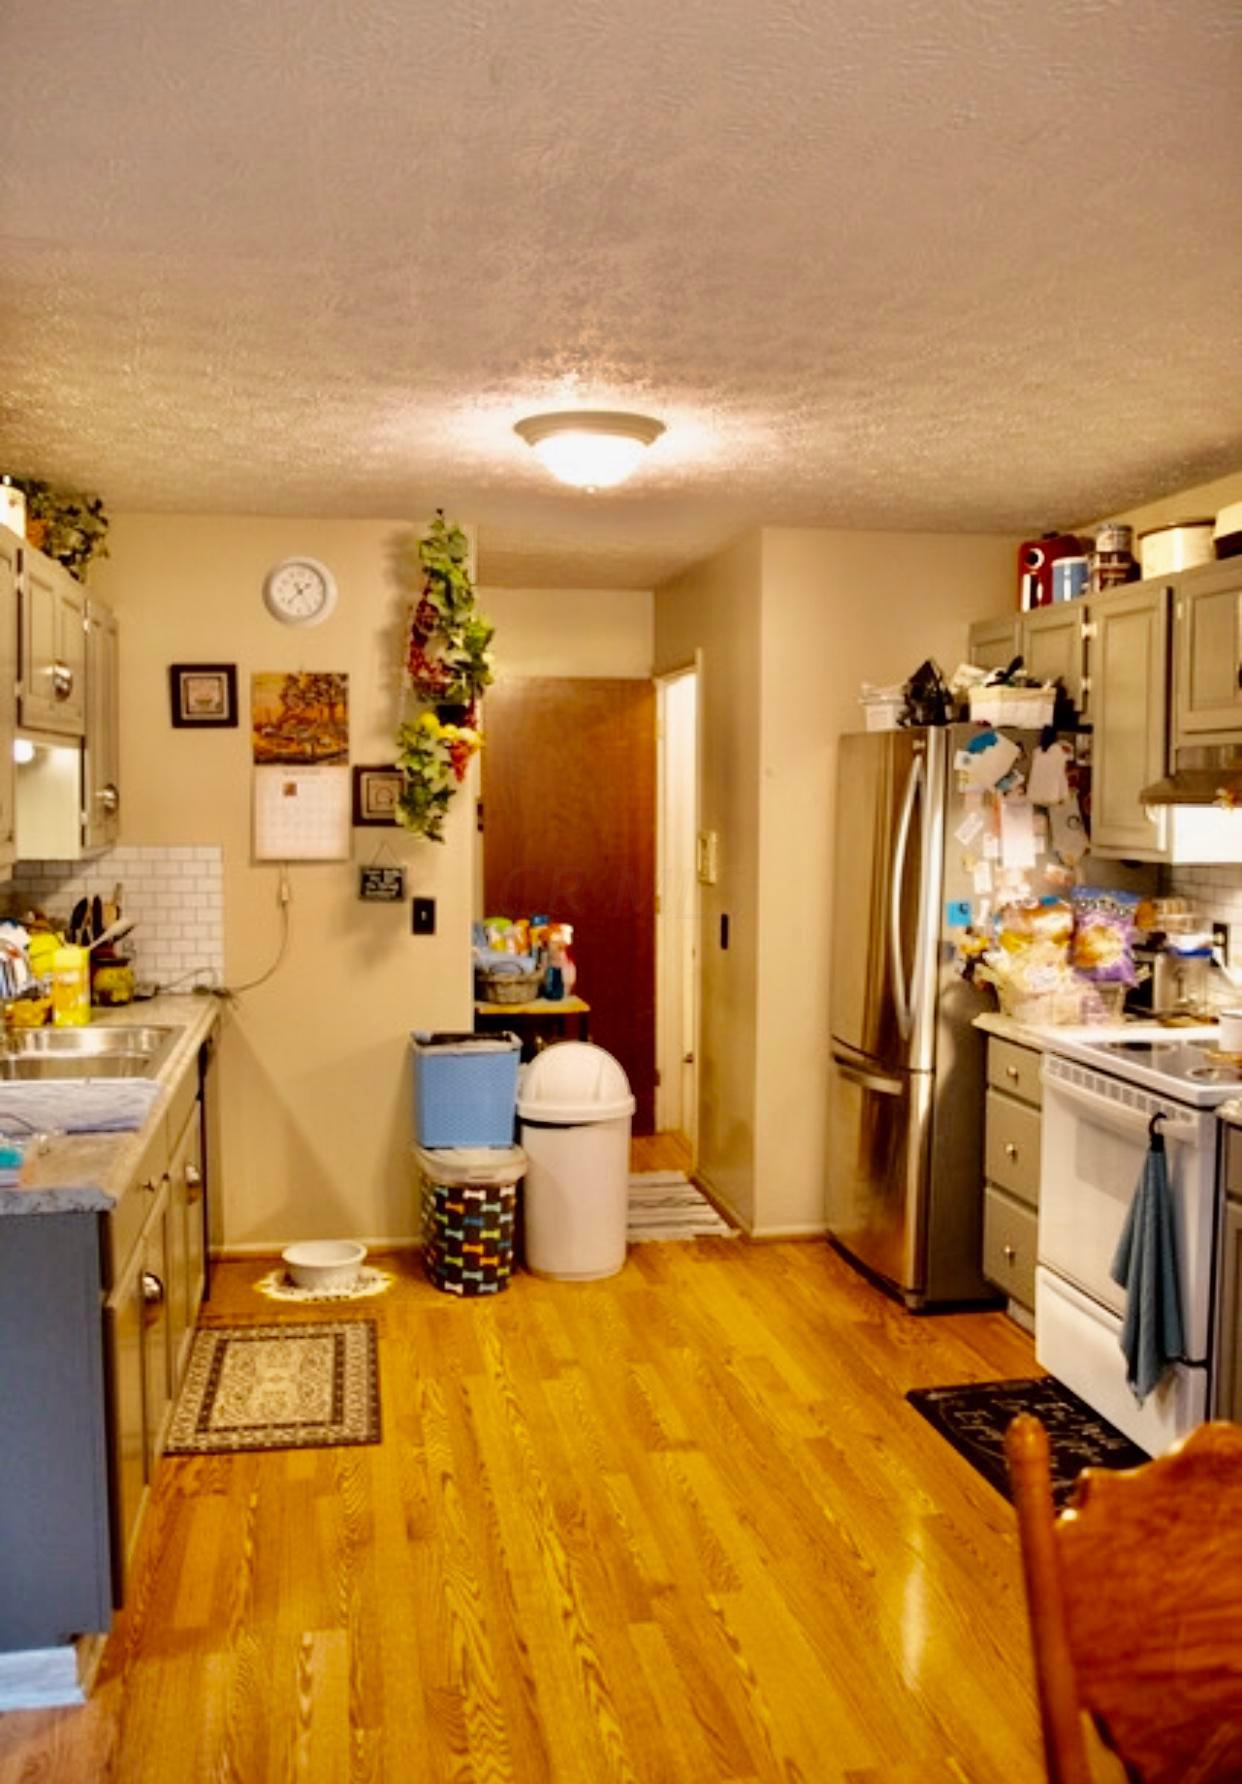 5662 Scotty Court, Hilliard, Ohio 43026, 3 Bedrooms Bedrooms, ,2 BathroomsBathrooms,Residential,For Sale,Scotty,220025731